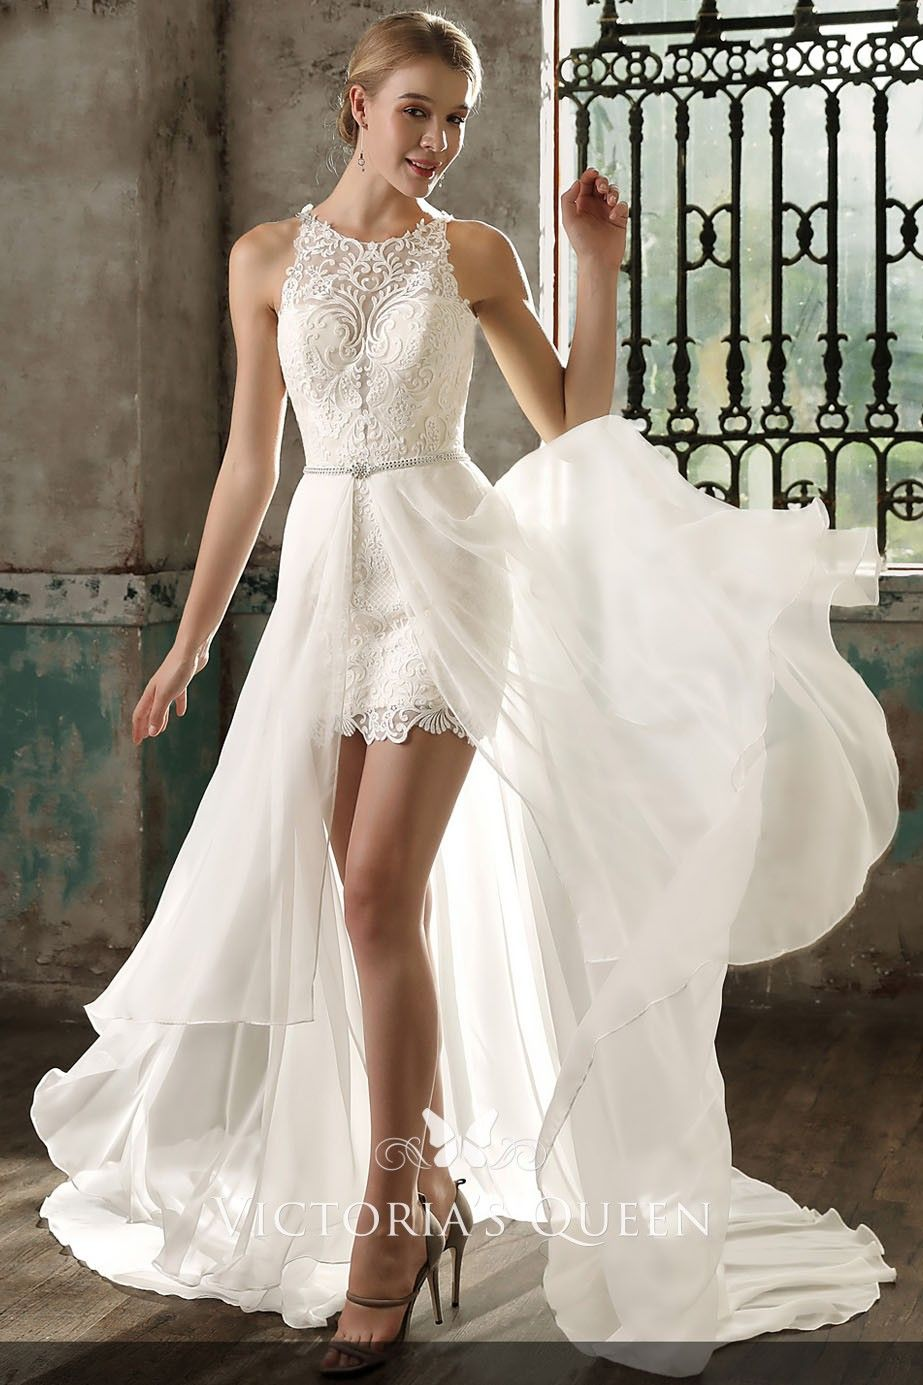 Ivory Lace And Chiffon Overskirt Short Wedding Dress Mini Wedding Dresses Wedding Reception Dress Wedding Dresses High Low [ 1385 x 923 Pixel ]